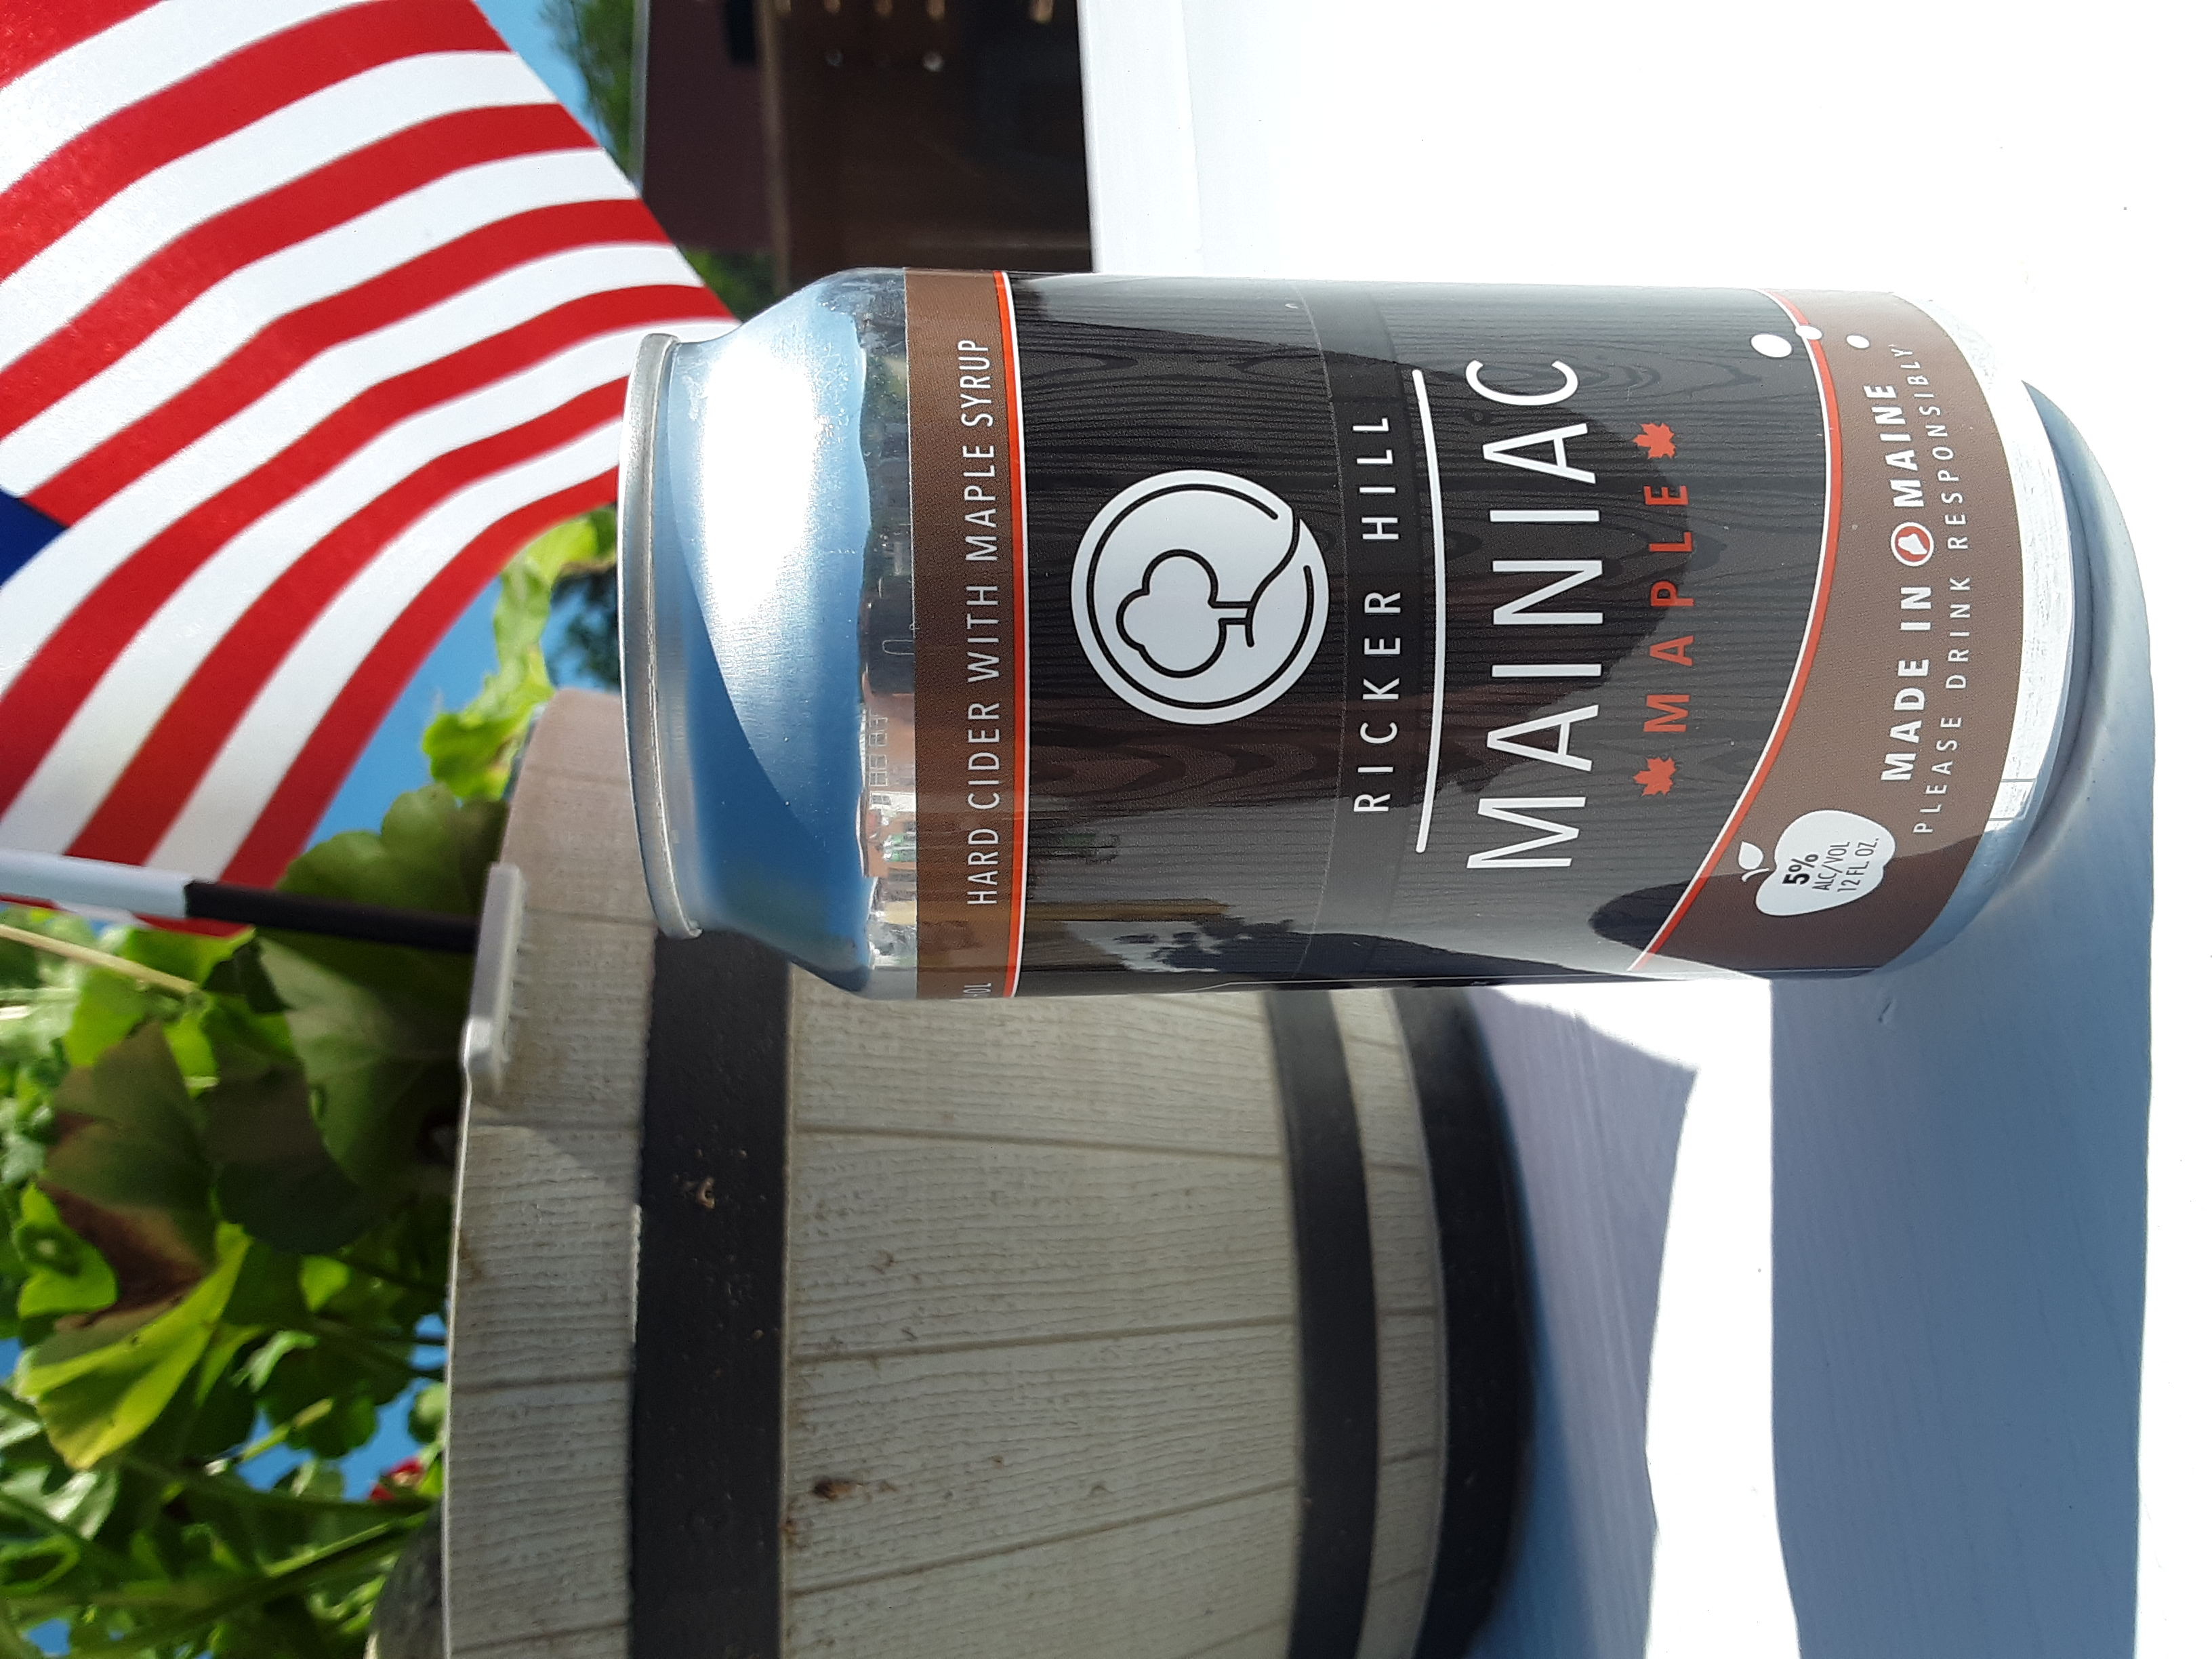 Ricker Hill Mainiac Maple hard cider